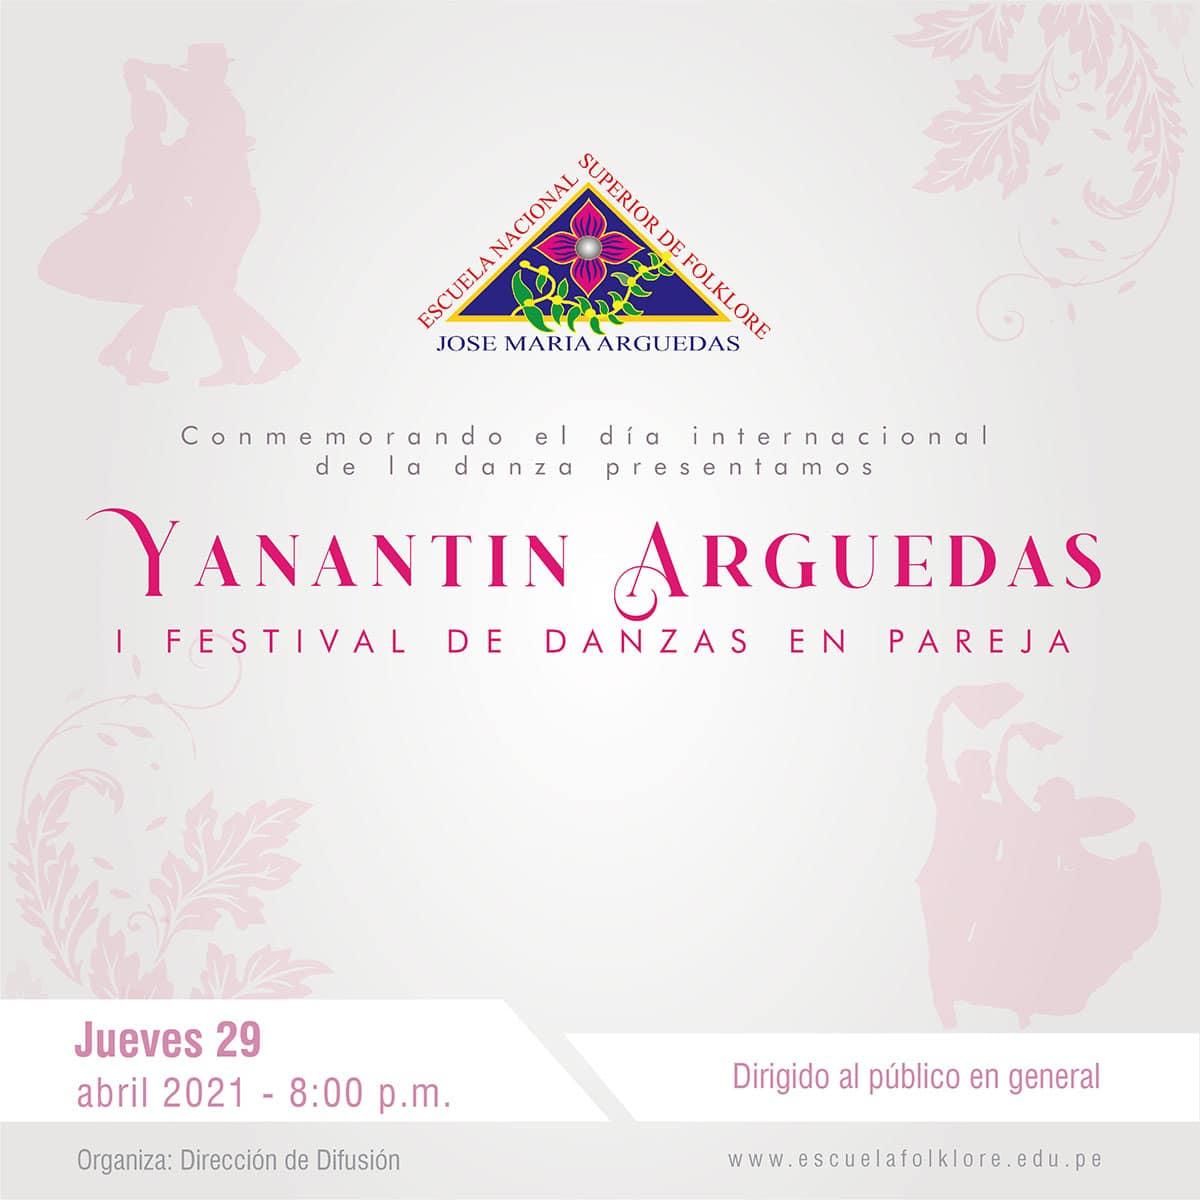 YANANTIN ARGUEDAS – I FESTIVAL DE DANZAS EN PAREJA